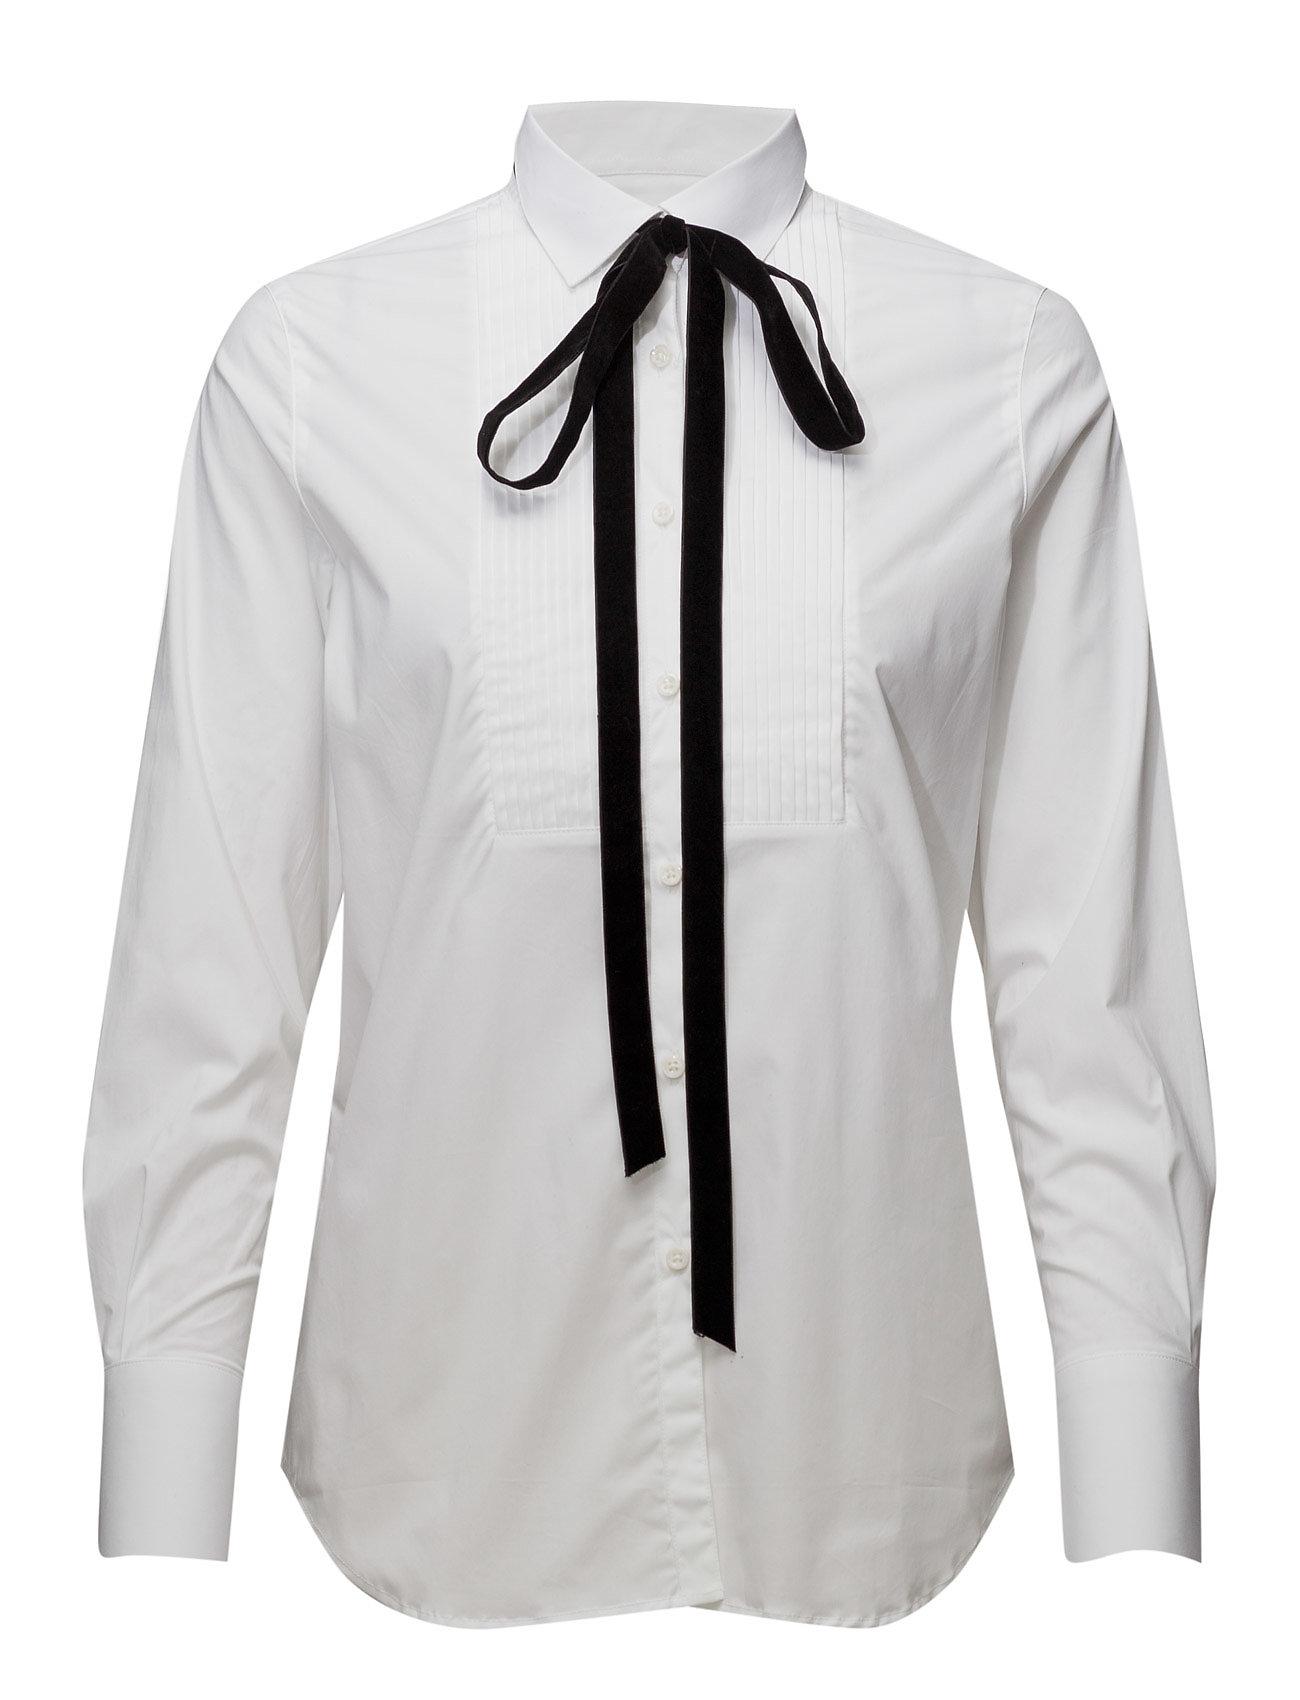 Morris Lady Dietrich Tuxedo Shirt